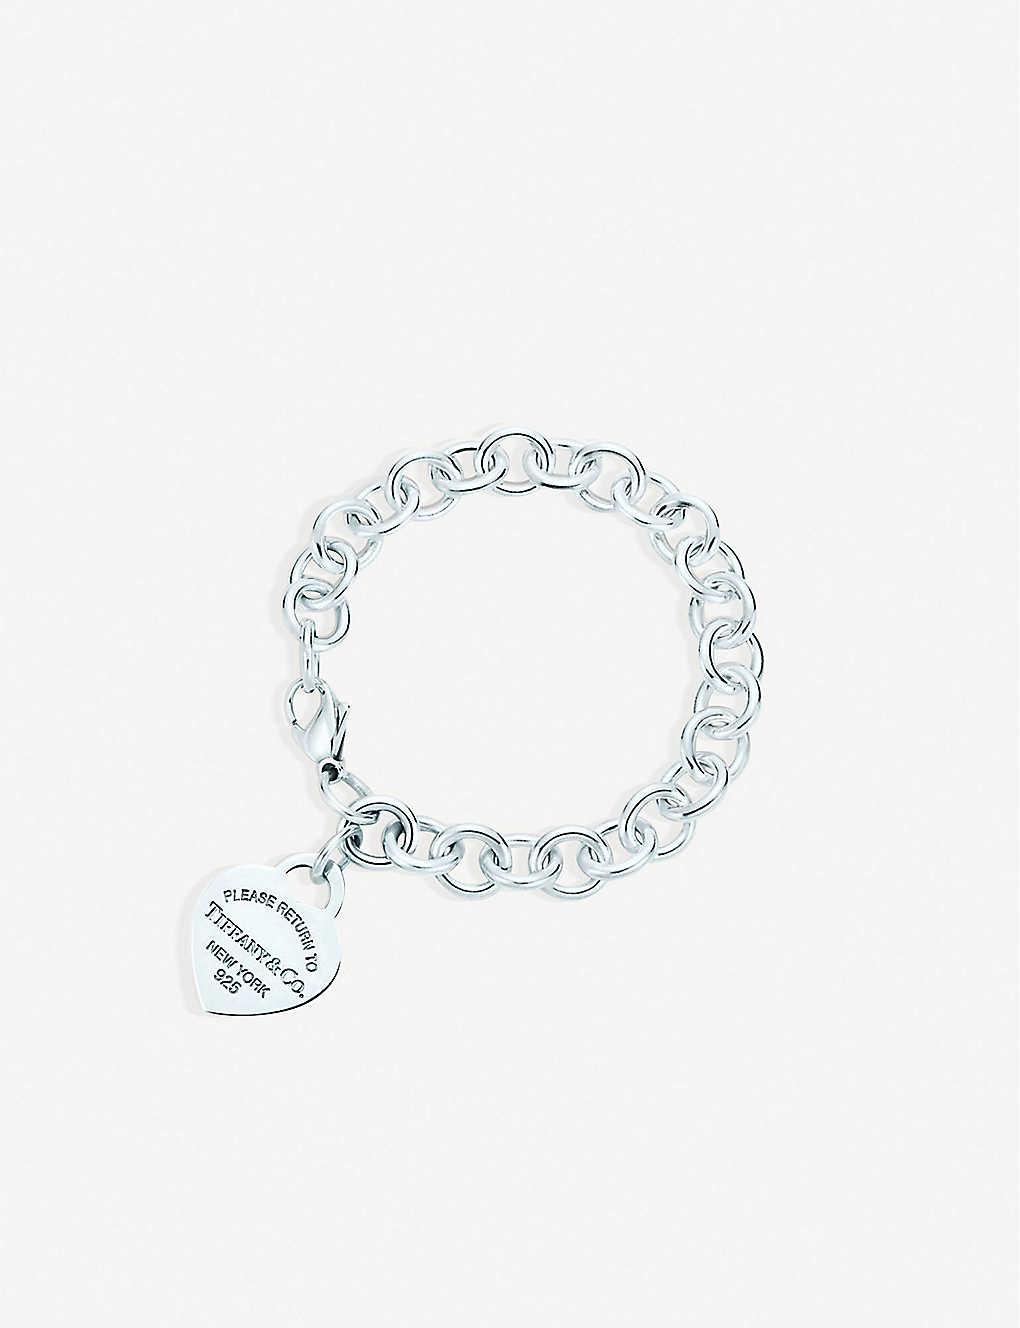 99d1dc535 TIFFANY & CO - Return to Tiffany Heart Tag Charm Bracelet ...